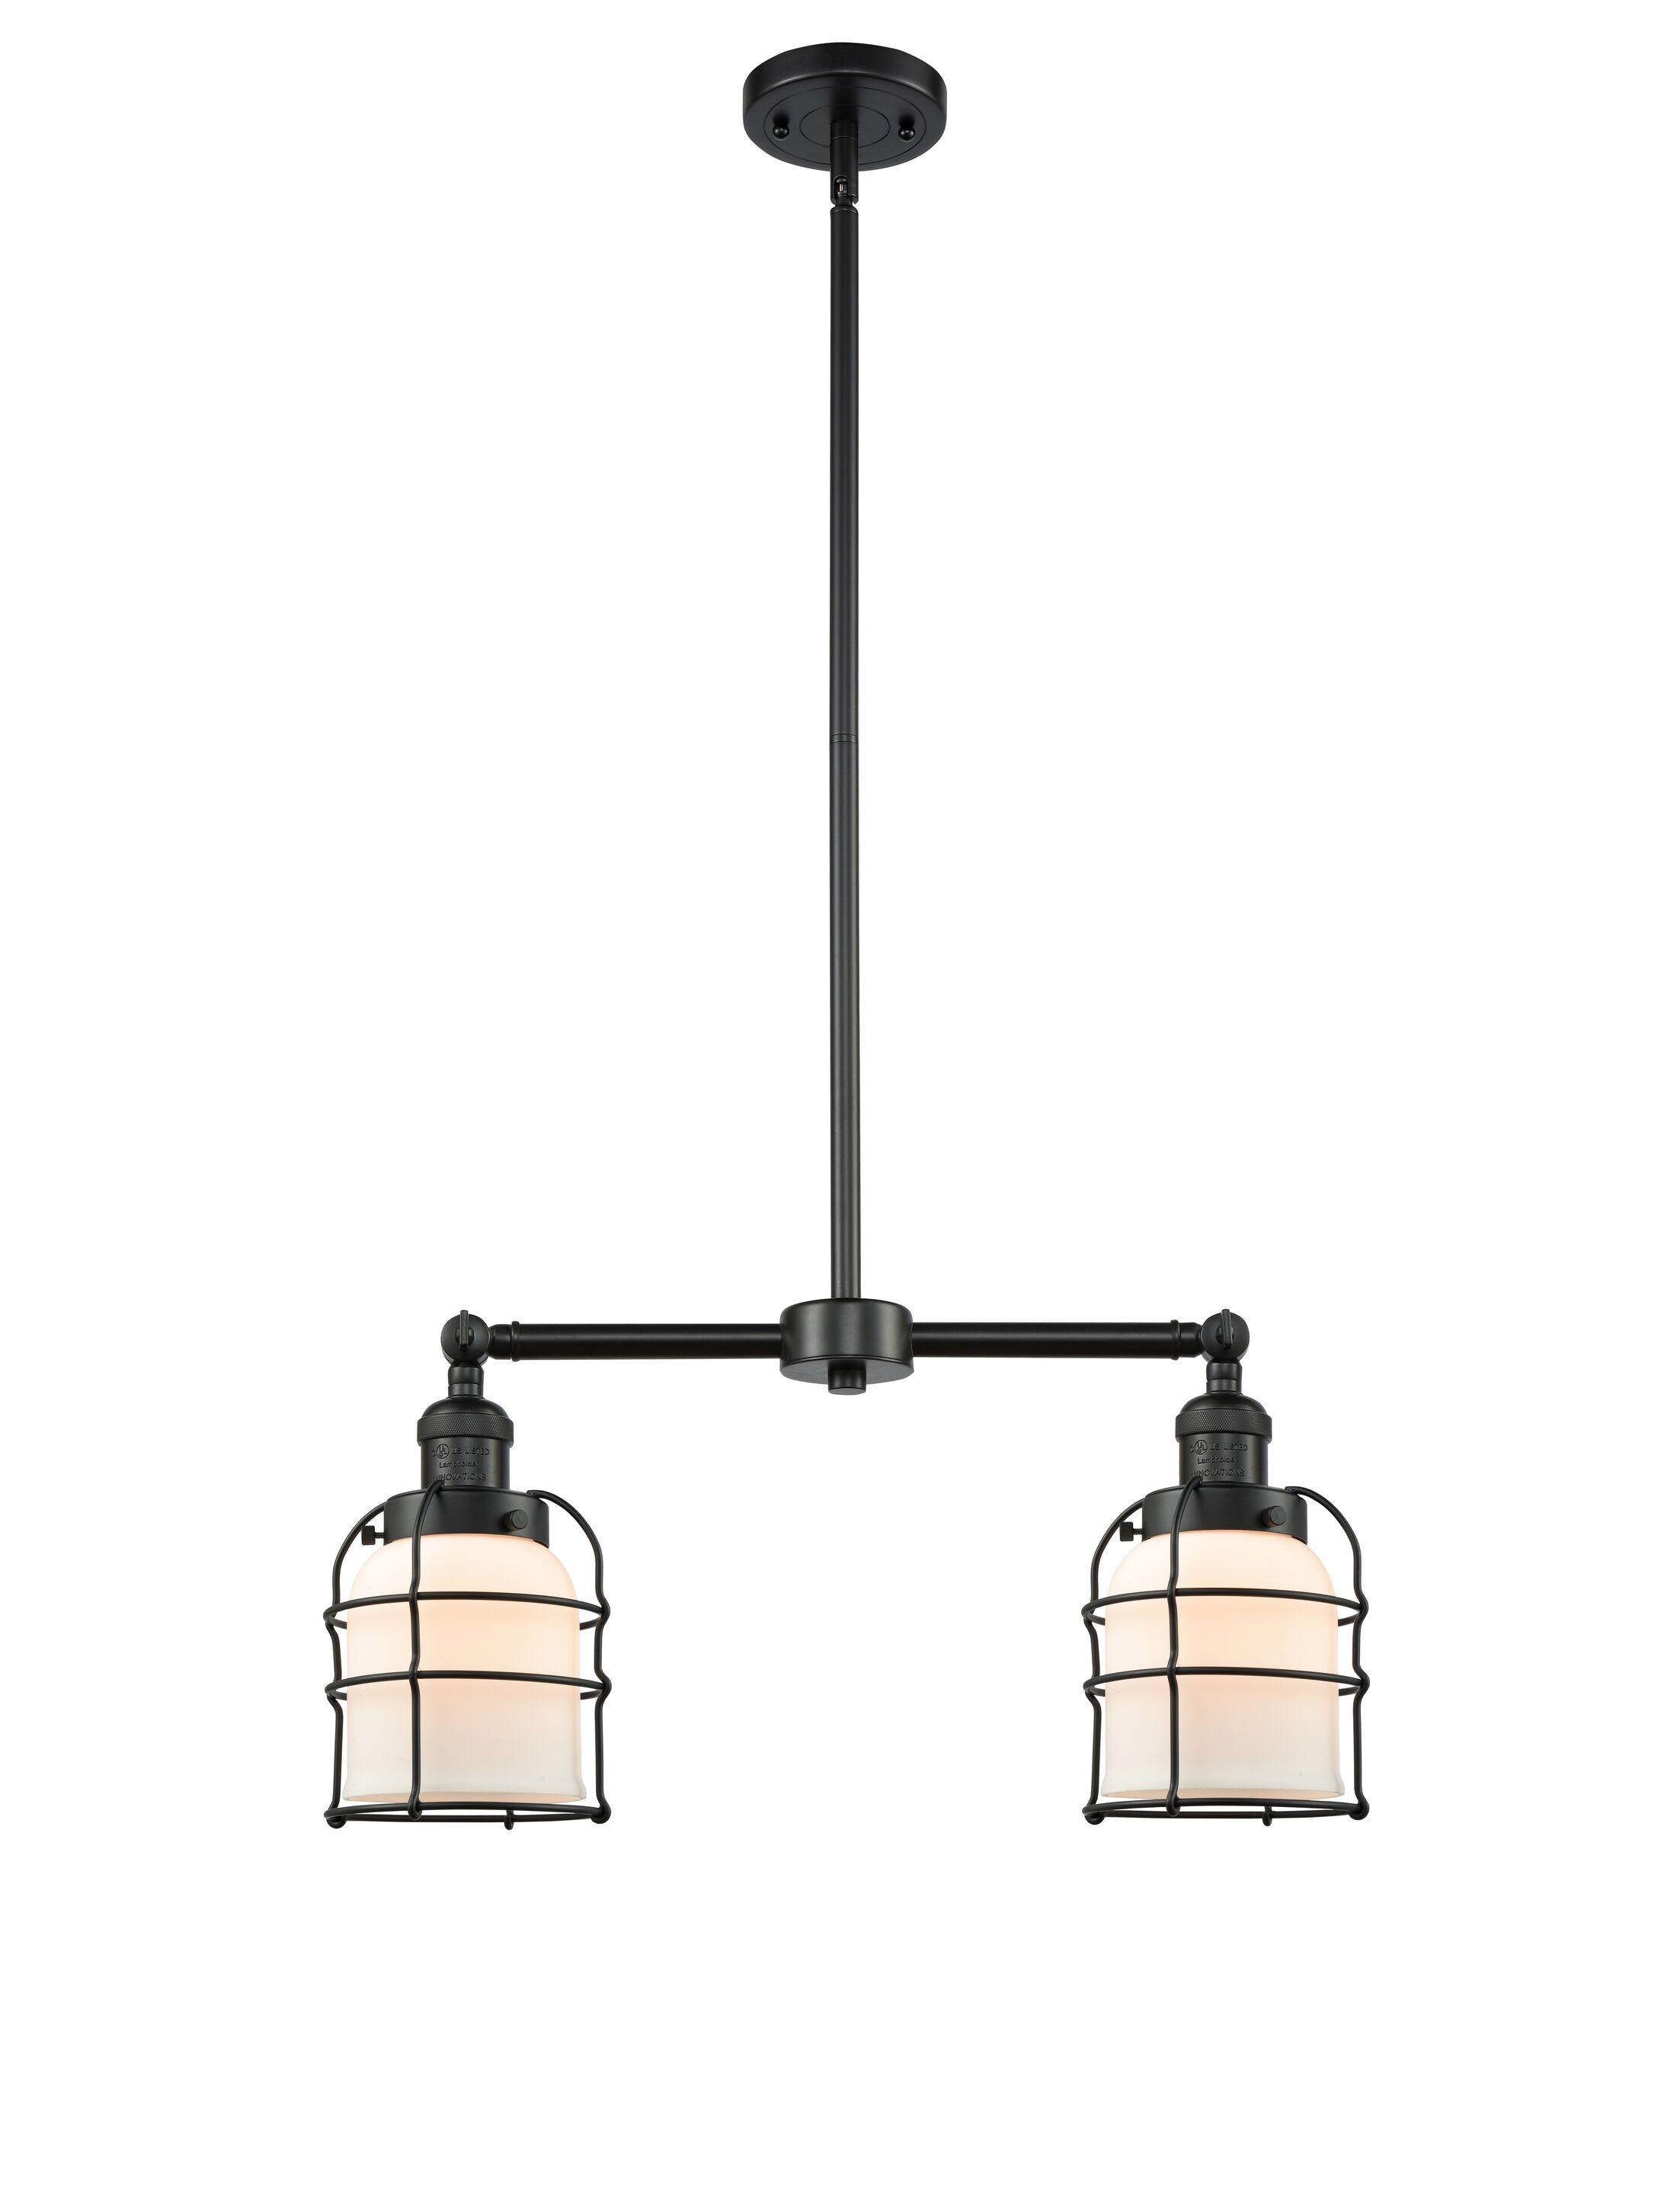 Moody 2-Light Kitchen Island Pendant Bulb Type: LED, Shade Color: Seedy